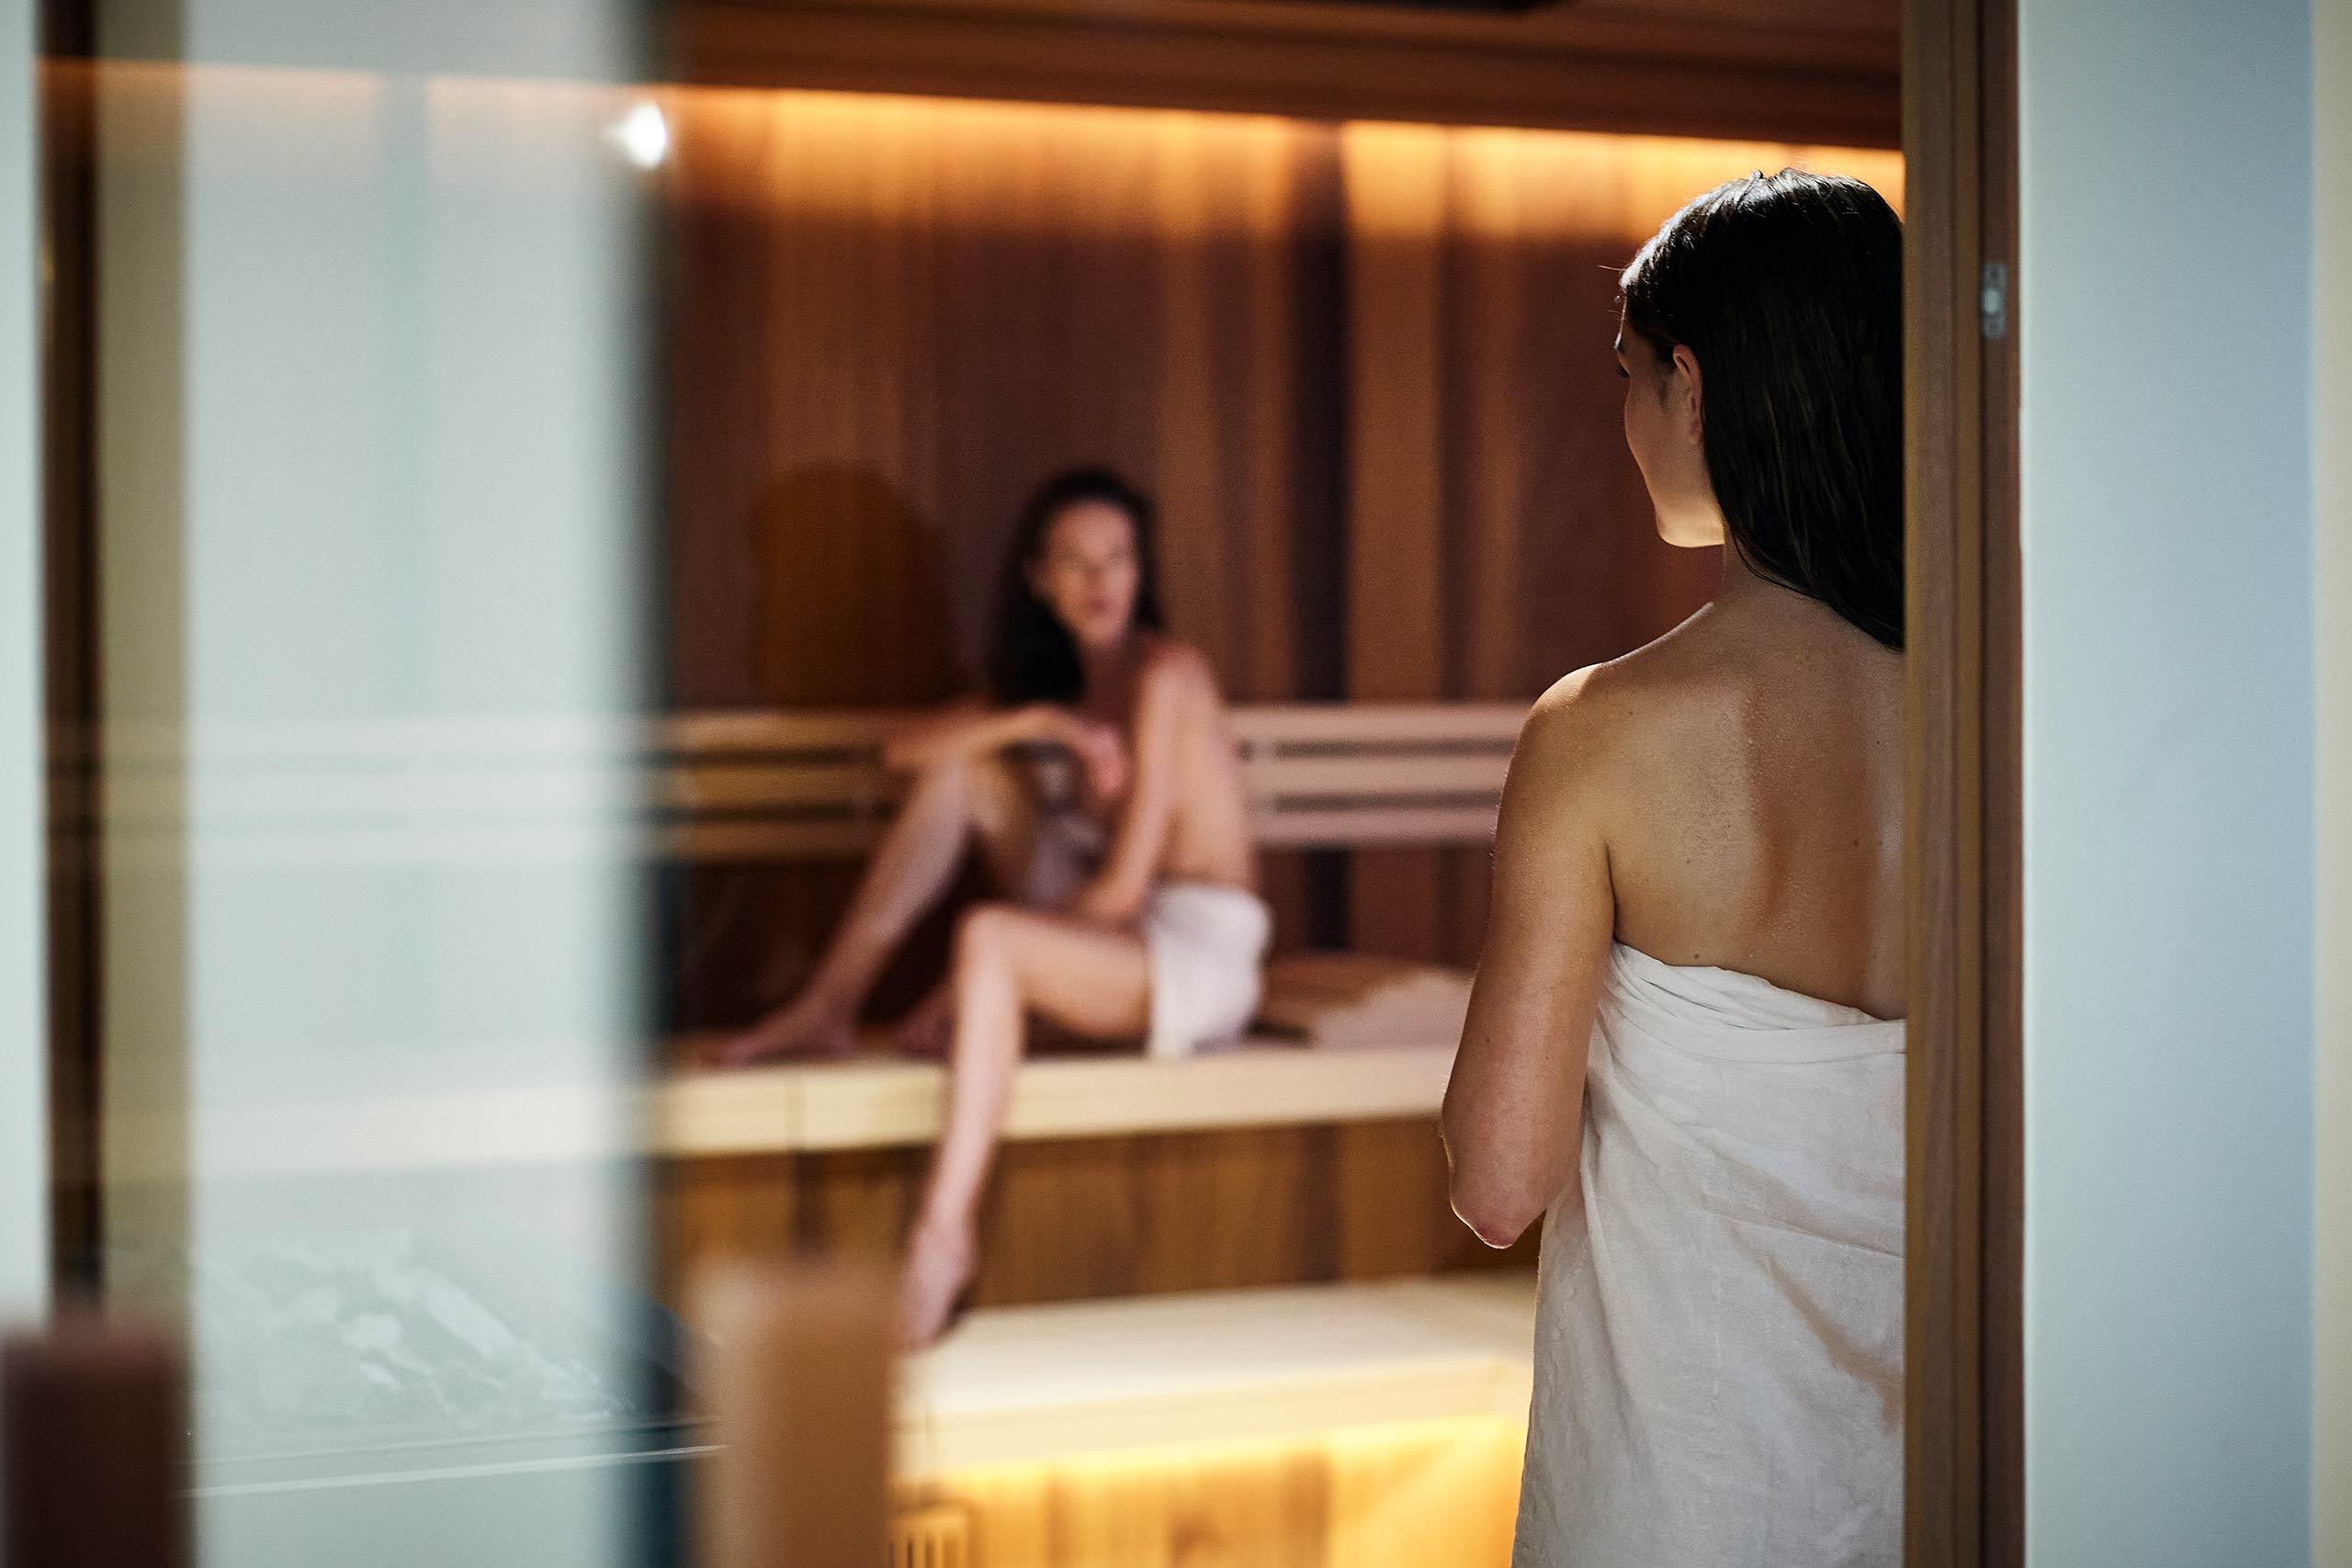 spiez-belvedere-wellness-oase-sauna.jpg